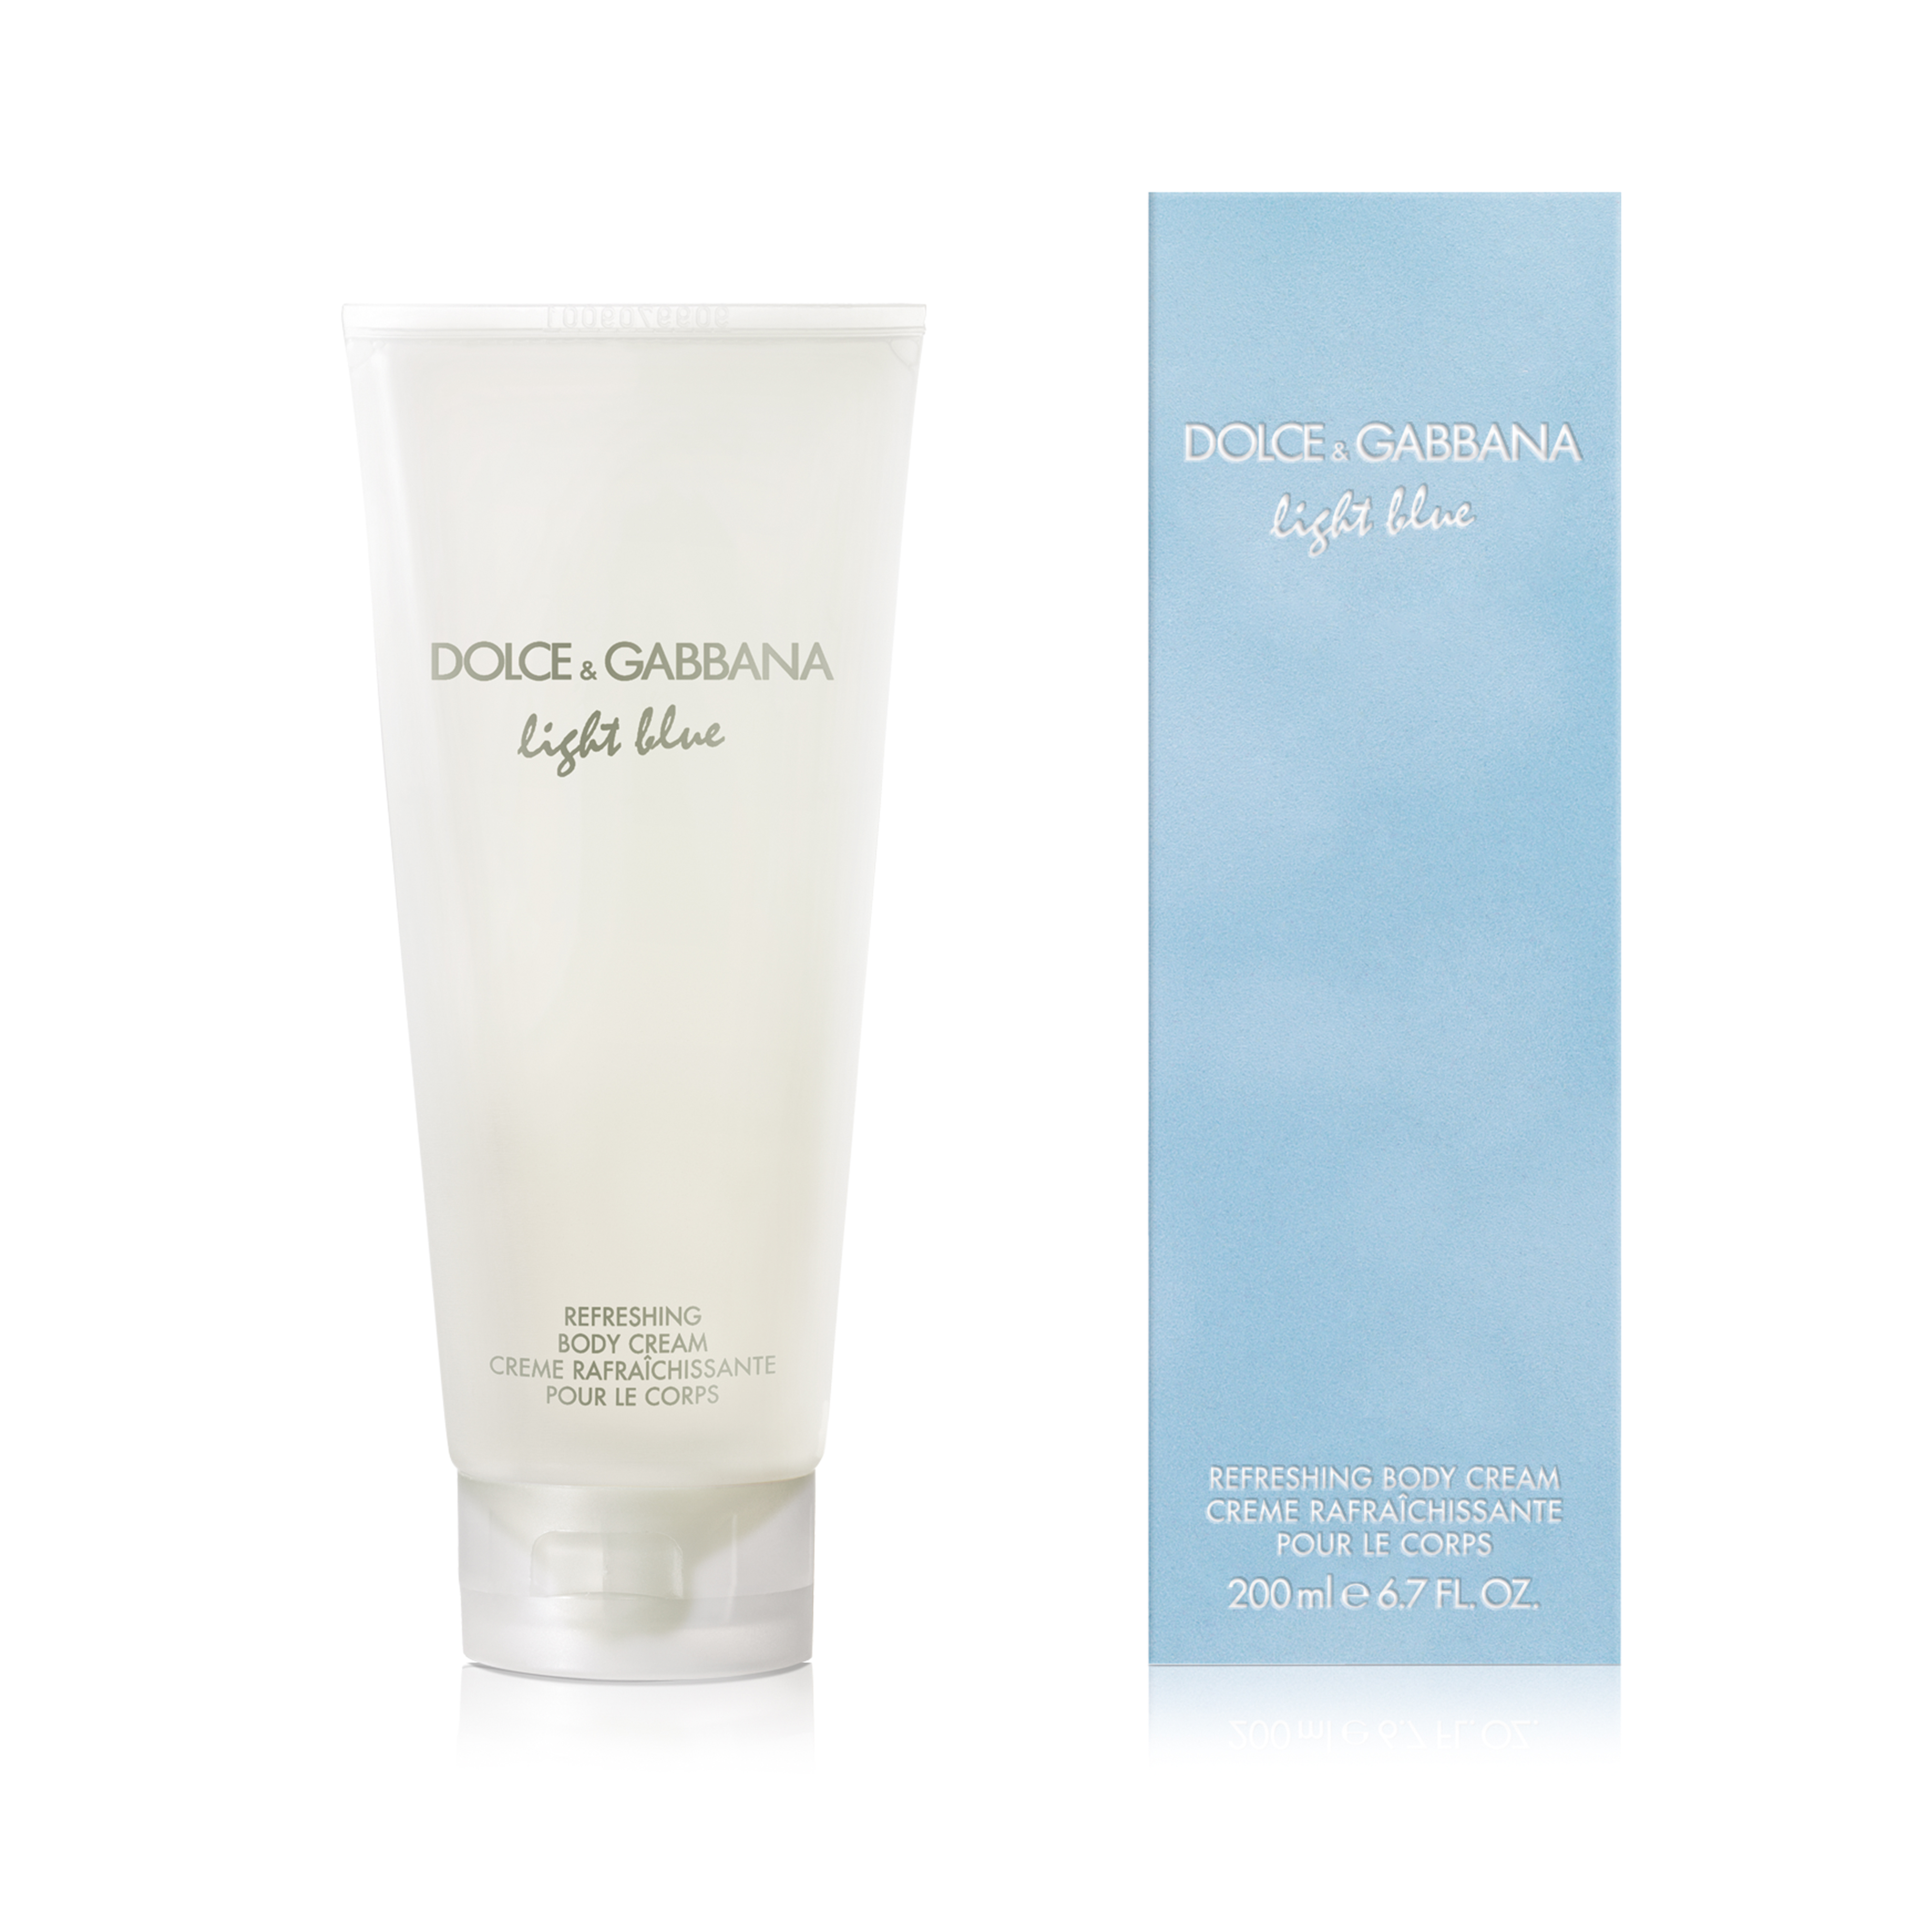 Light Blue Body Cream 200ml